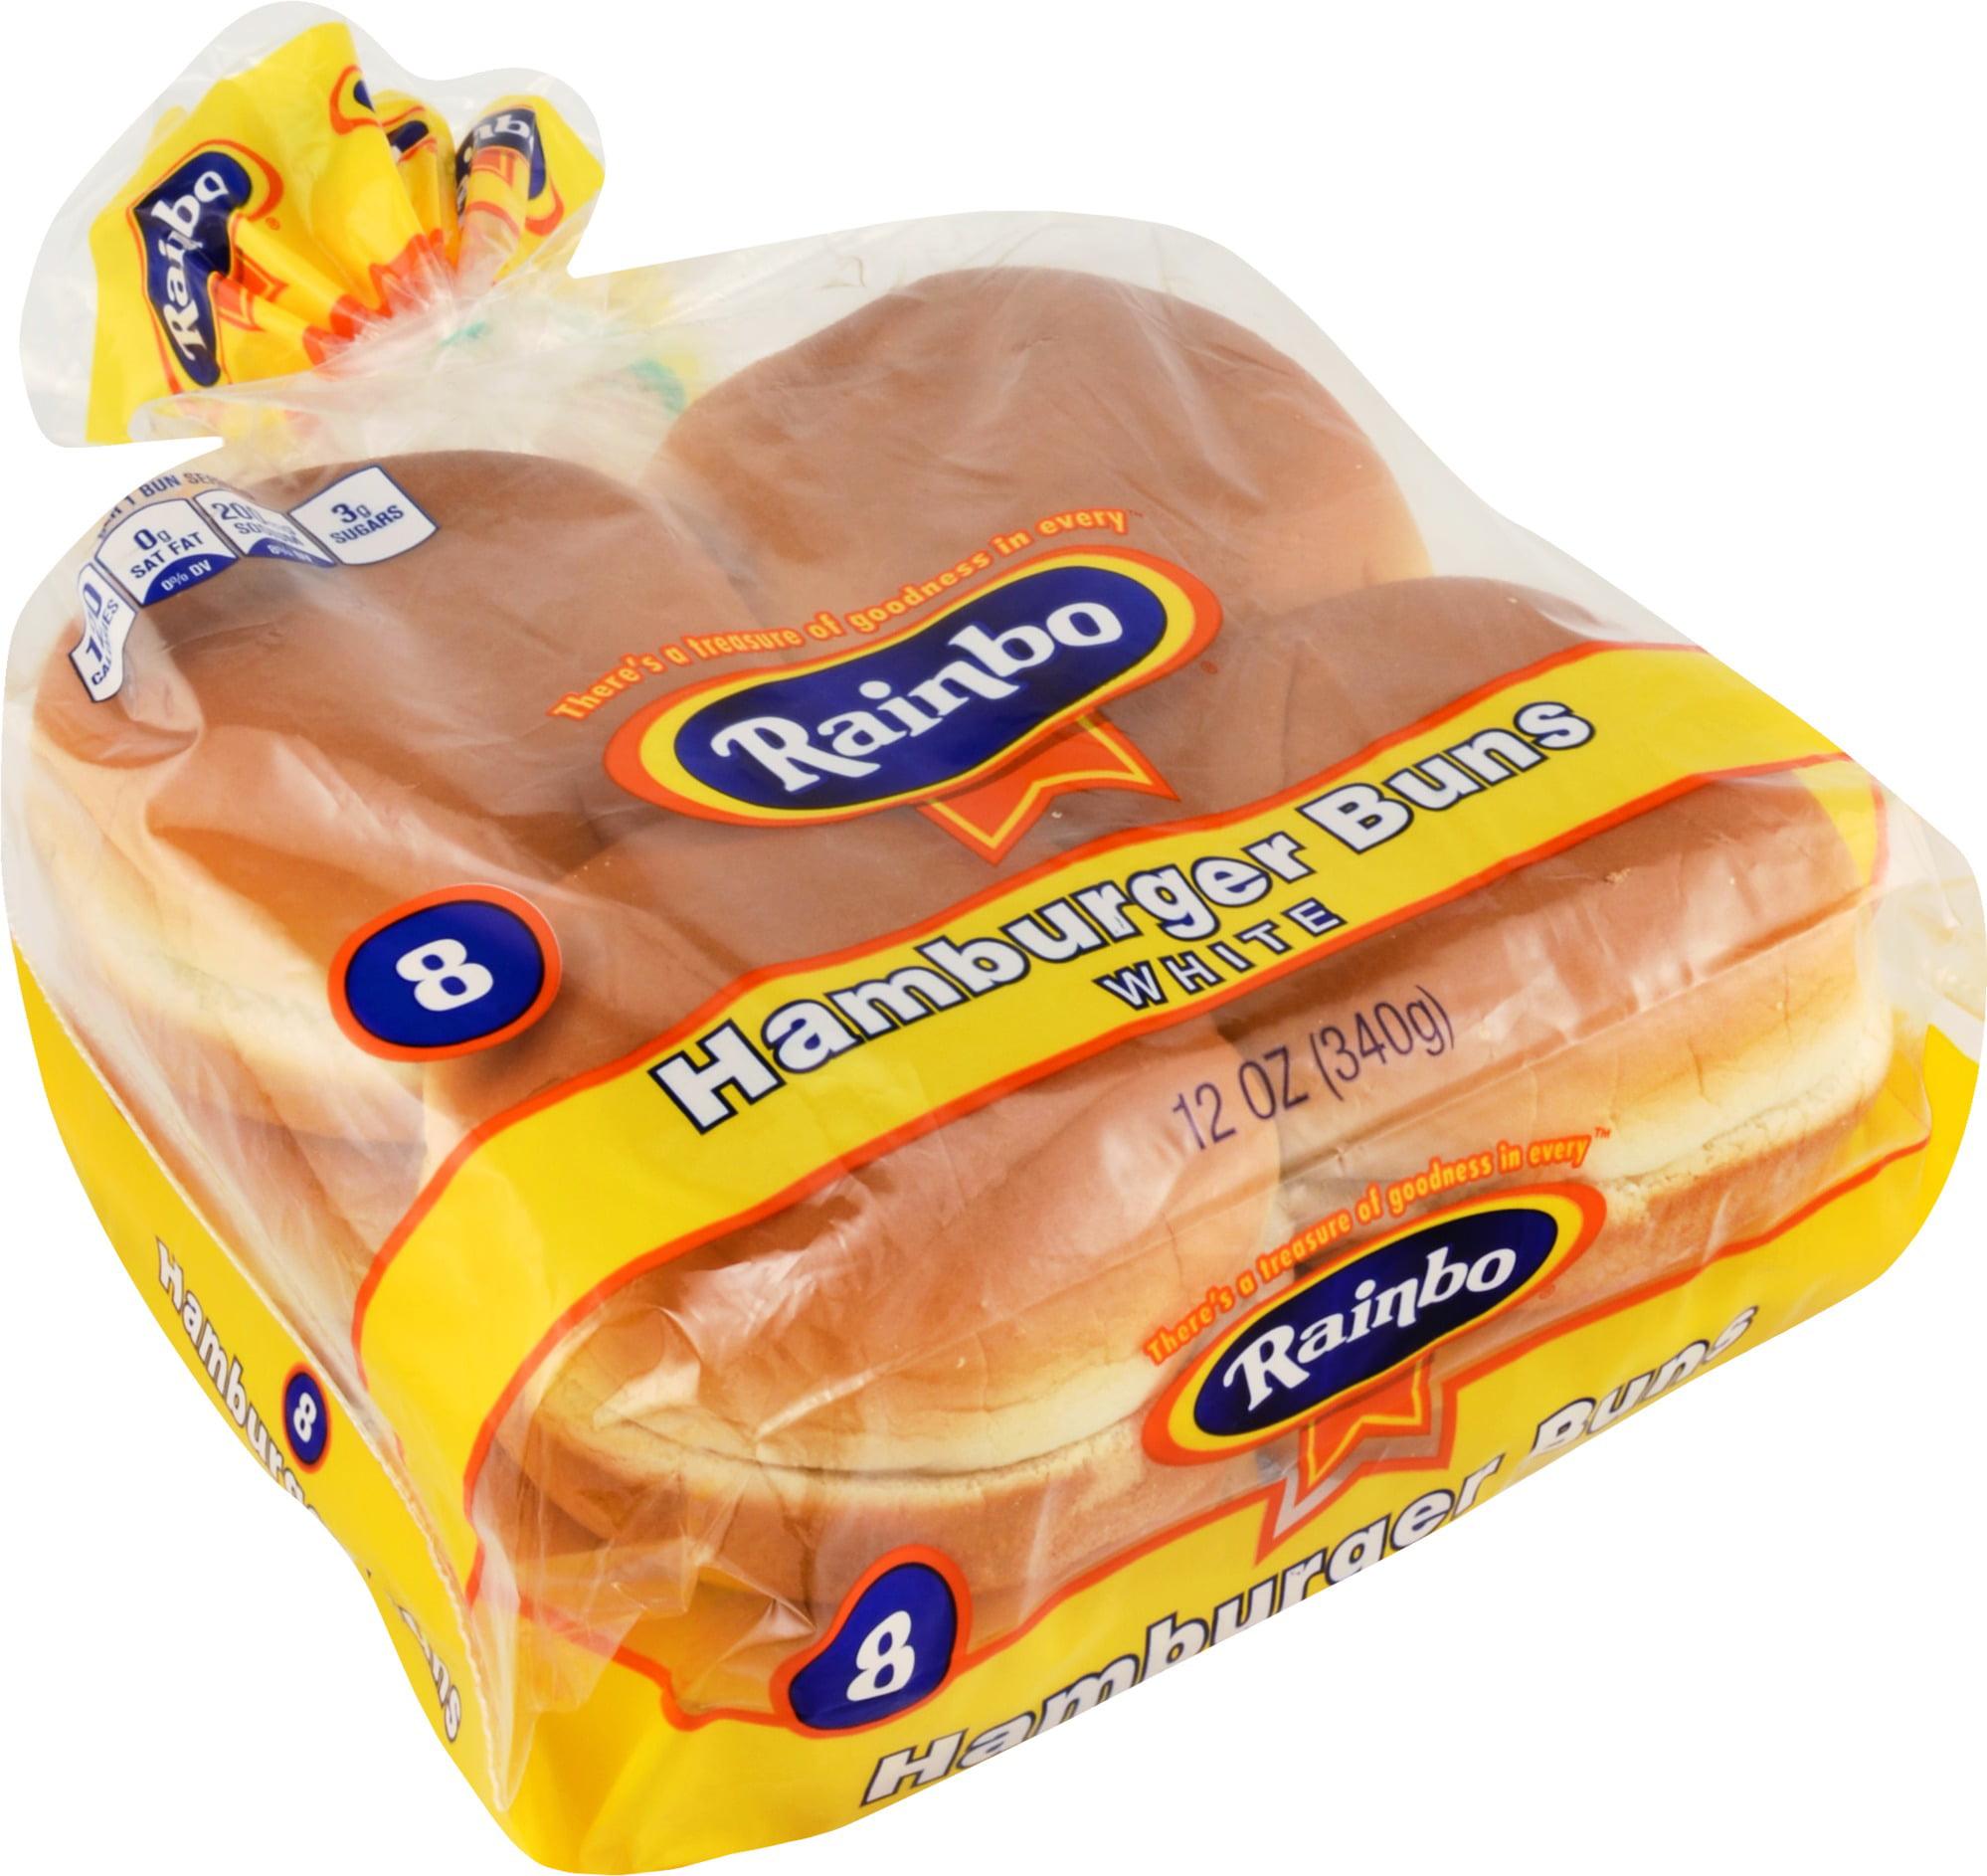 Rainbo Hamburger Buns, 8 count, 12 oz